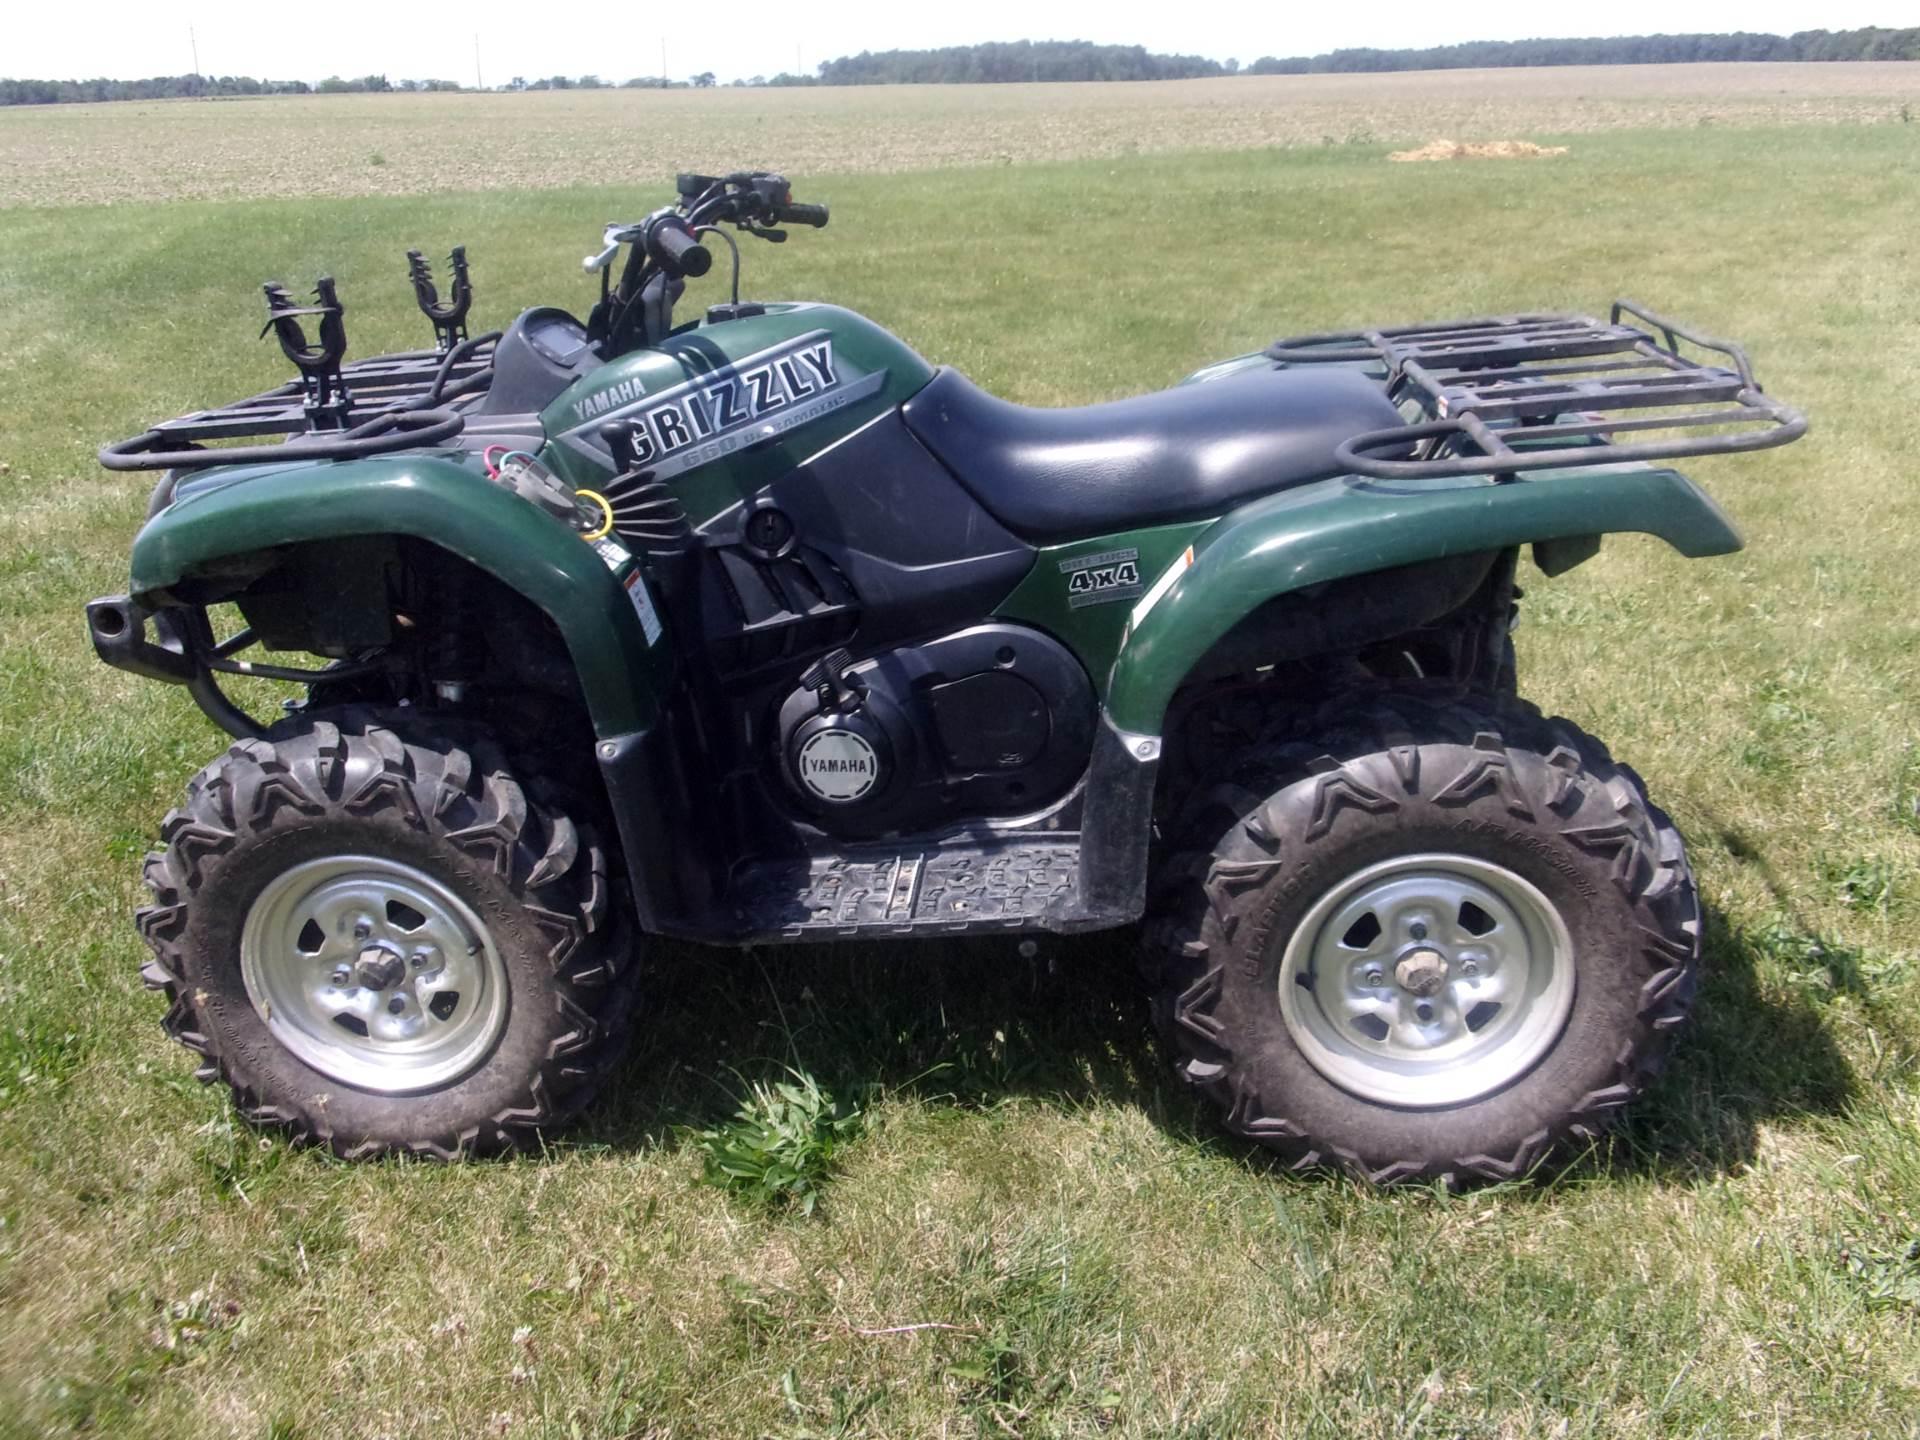 2002 Yamaha Grizzly 660 1